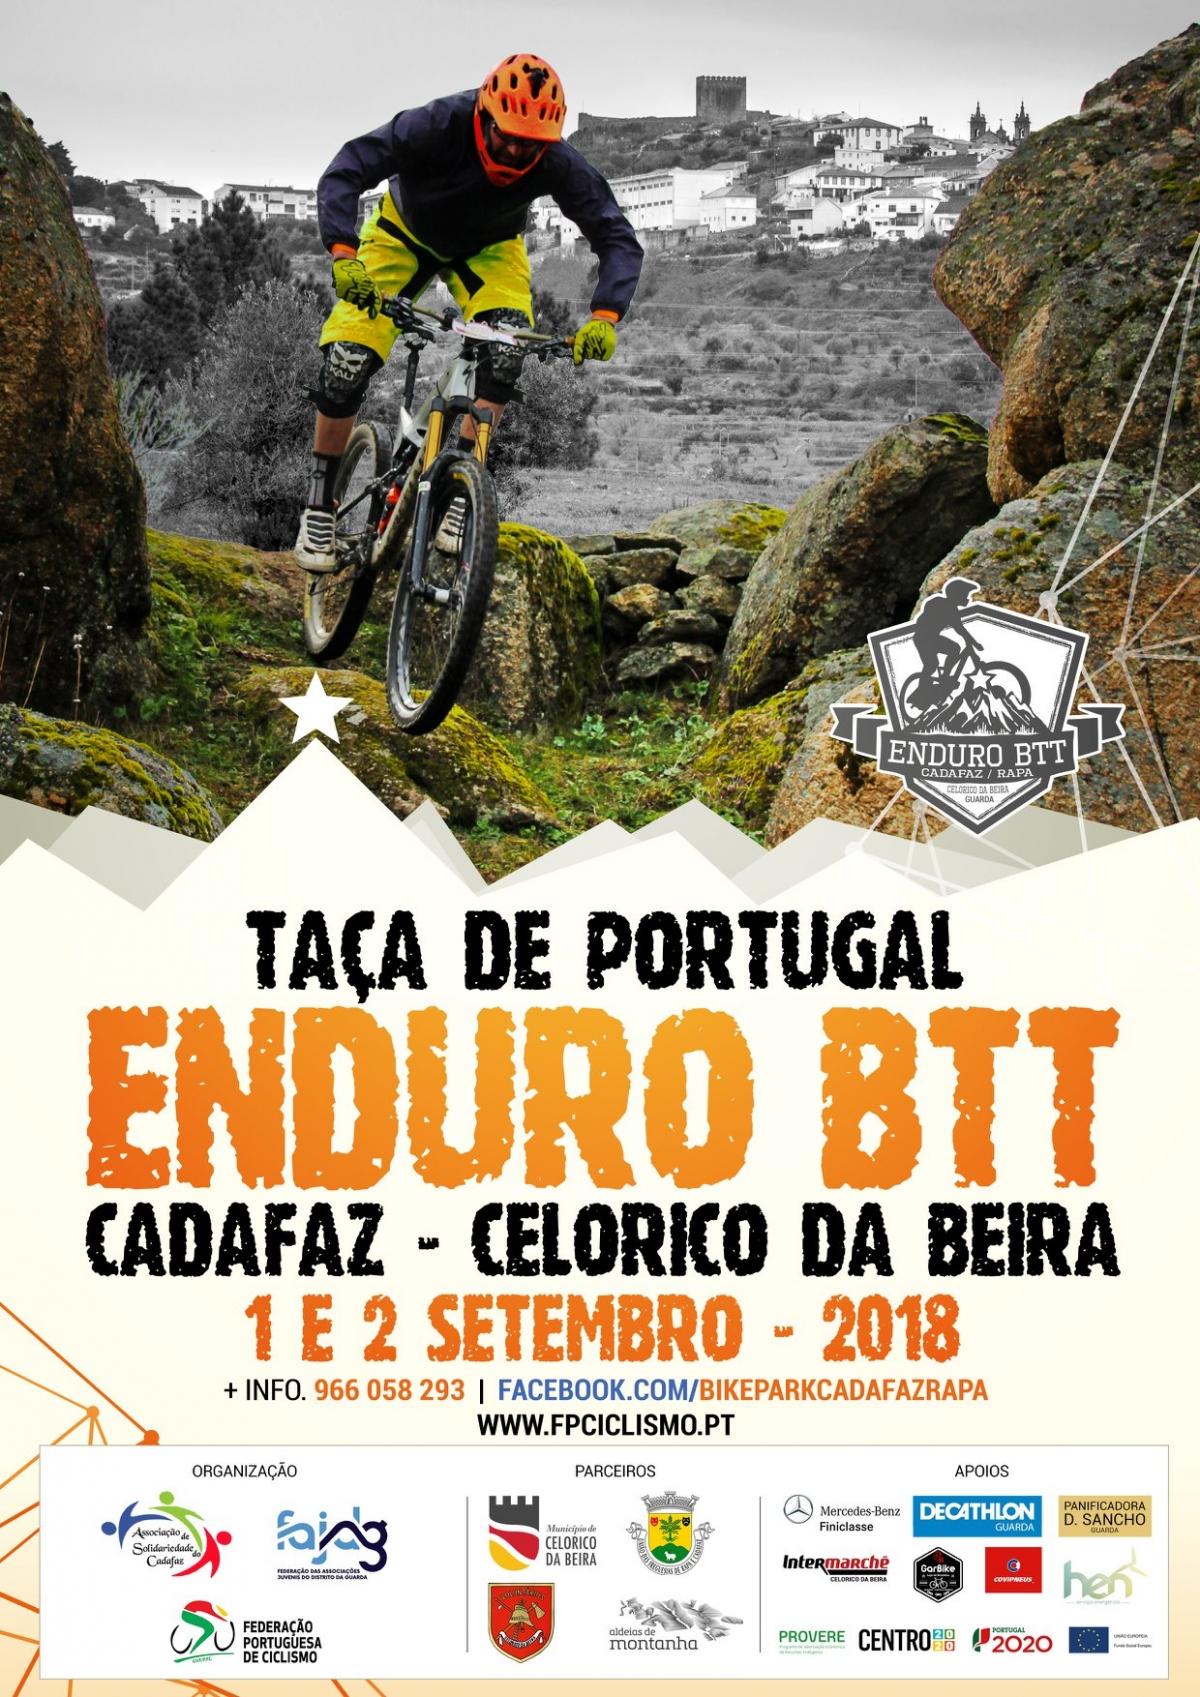 Taca de Portugal Enduro BTT